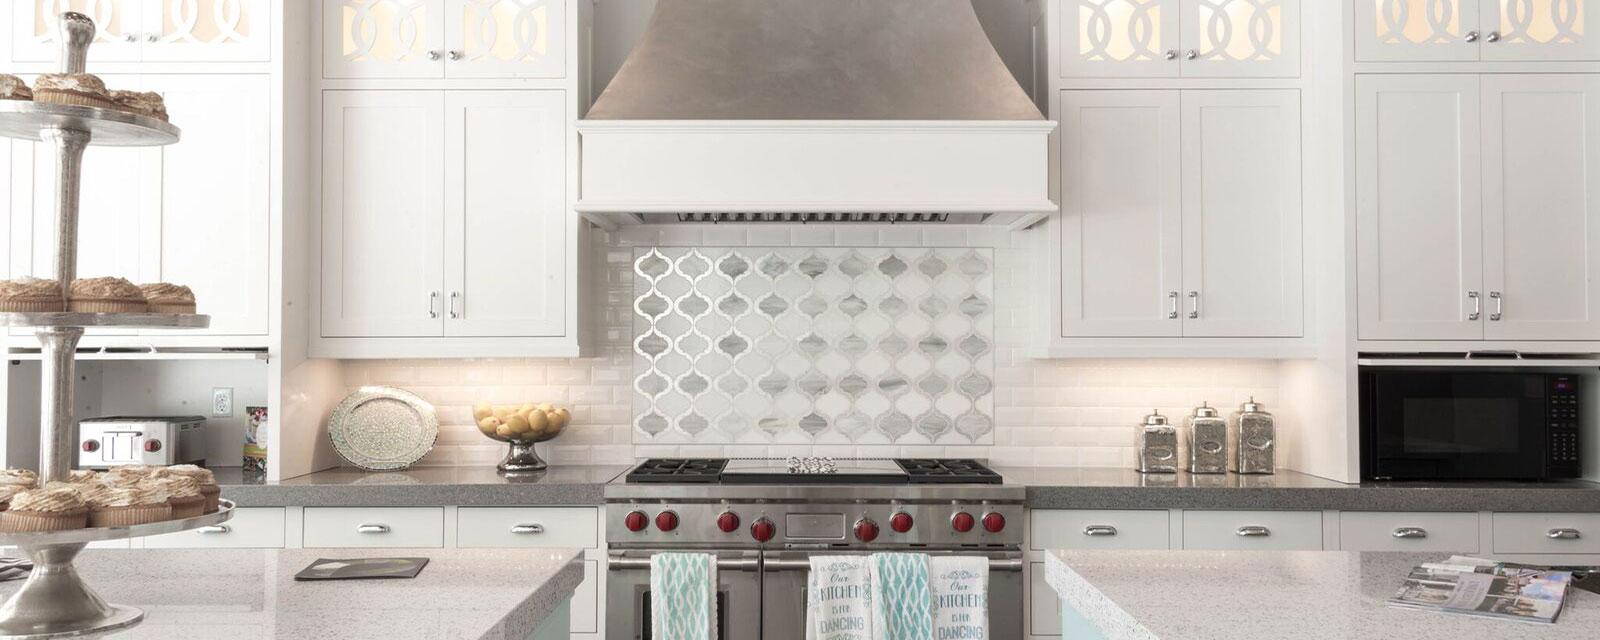 kbbonline kitchen and bath design Project Kitchen